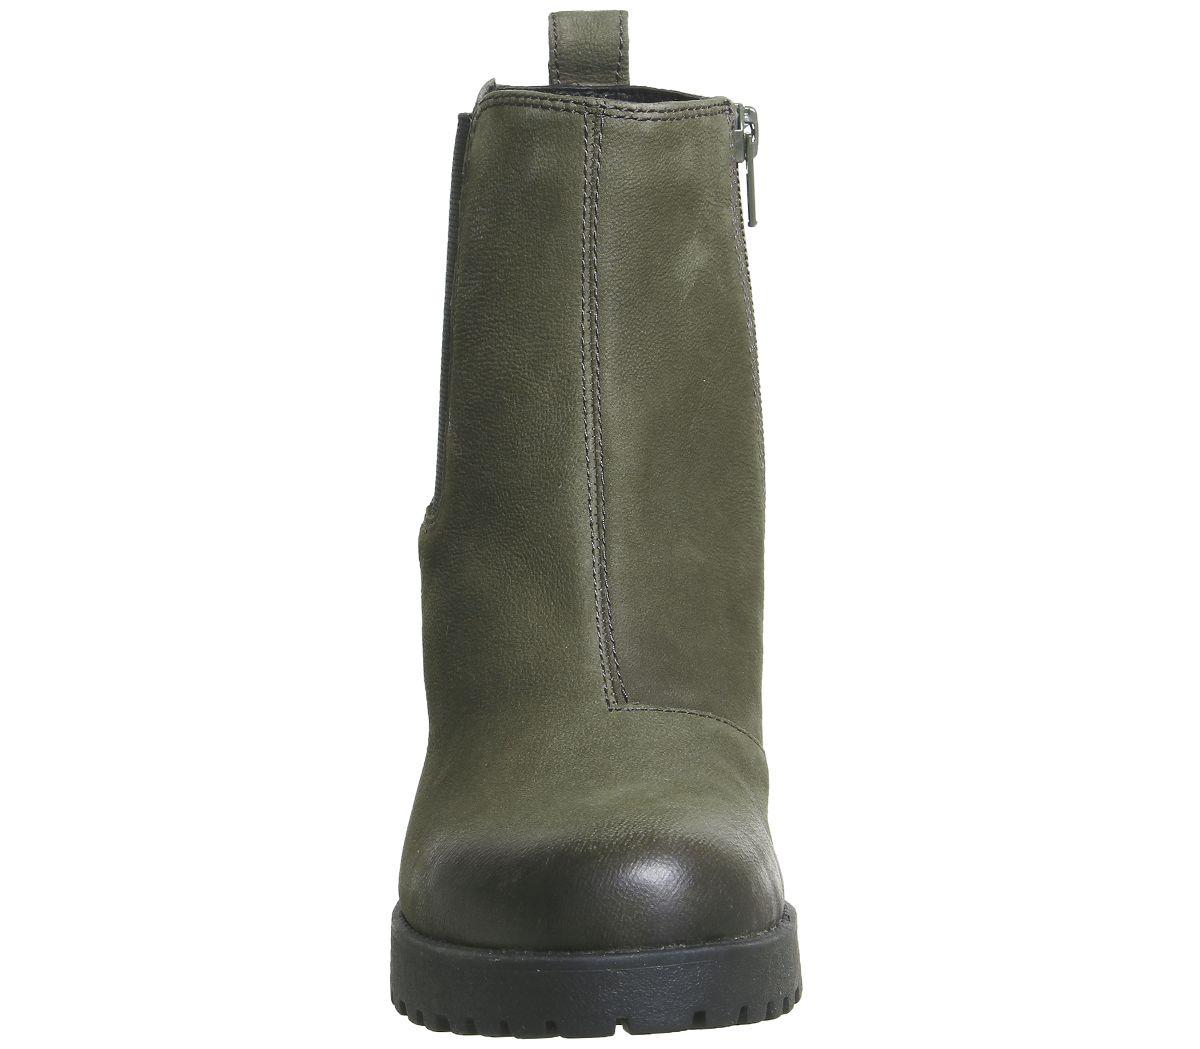 7dfab9848 Womens Vagabond Grace Heeled Chelsea Boots Dark Olive Nubuck Boots ...